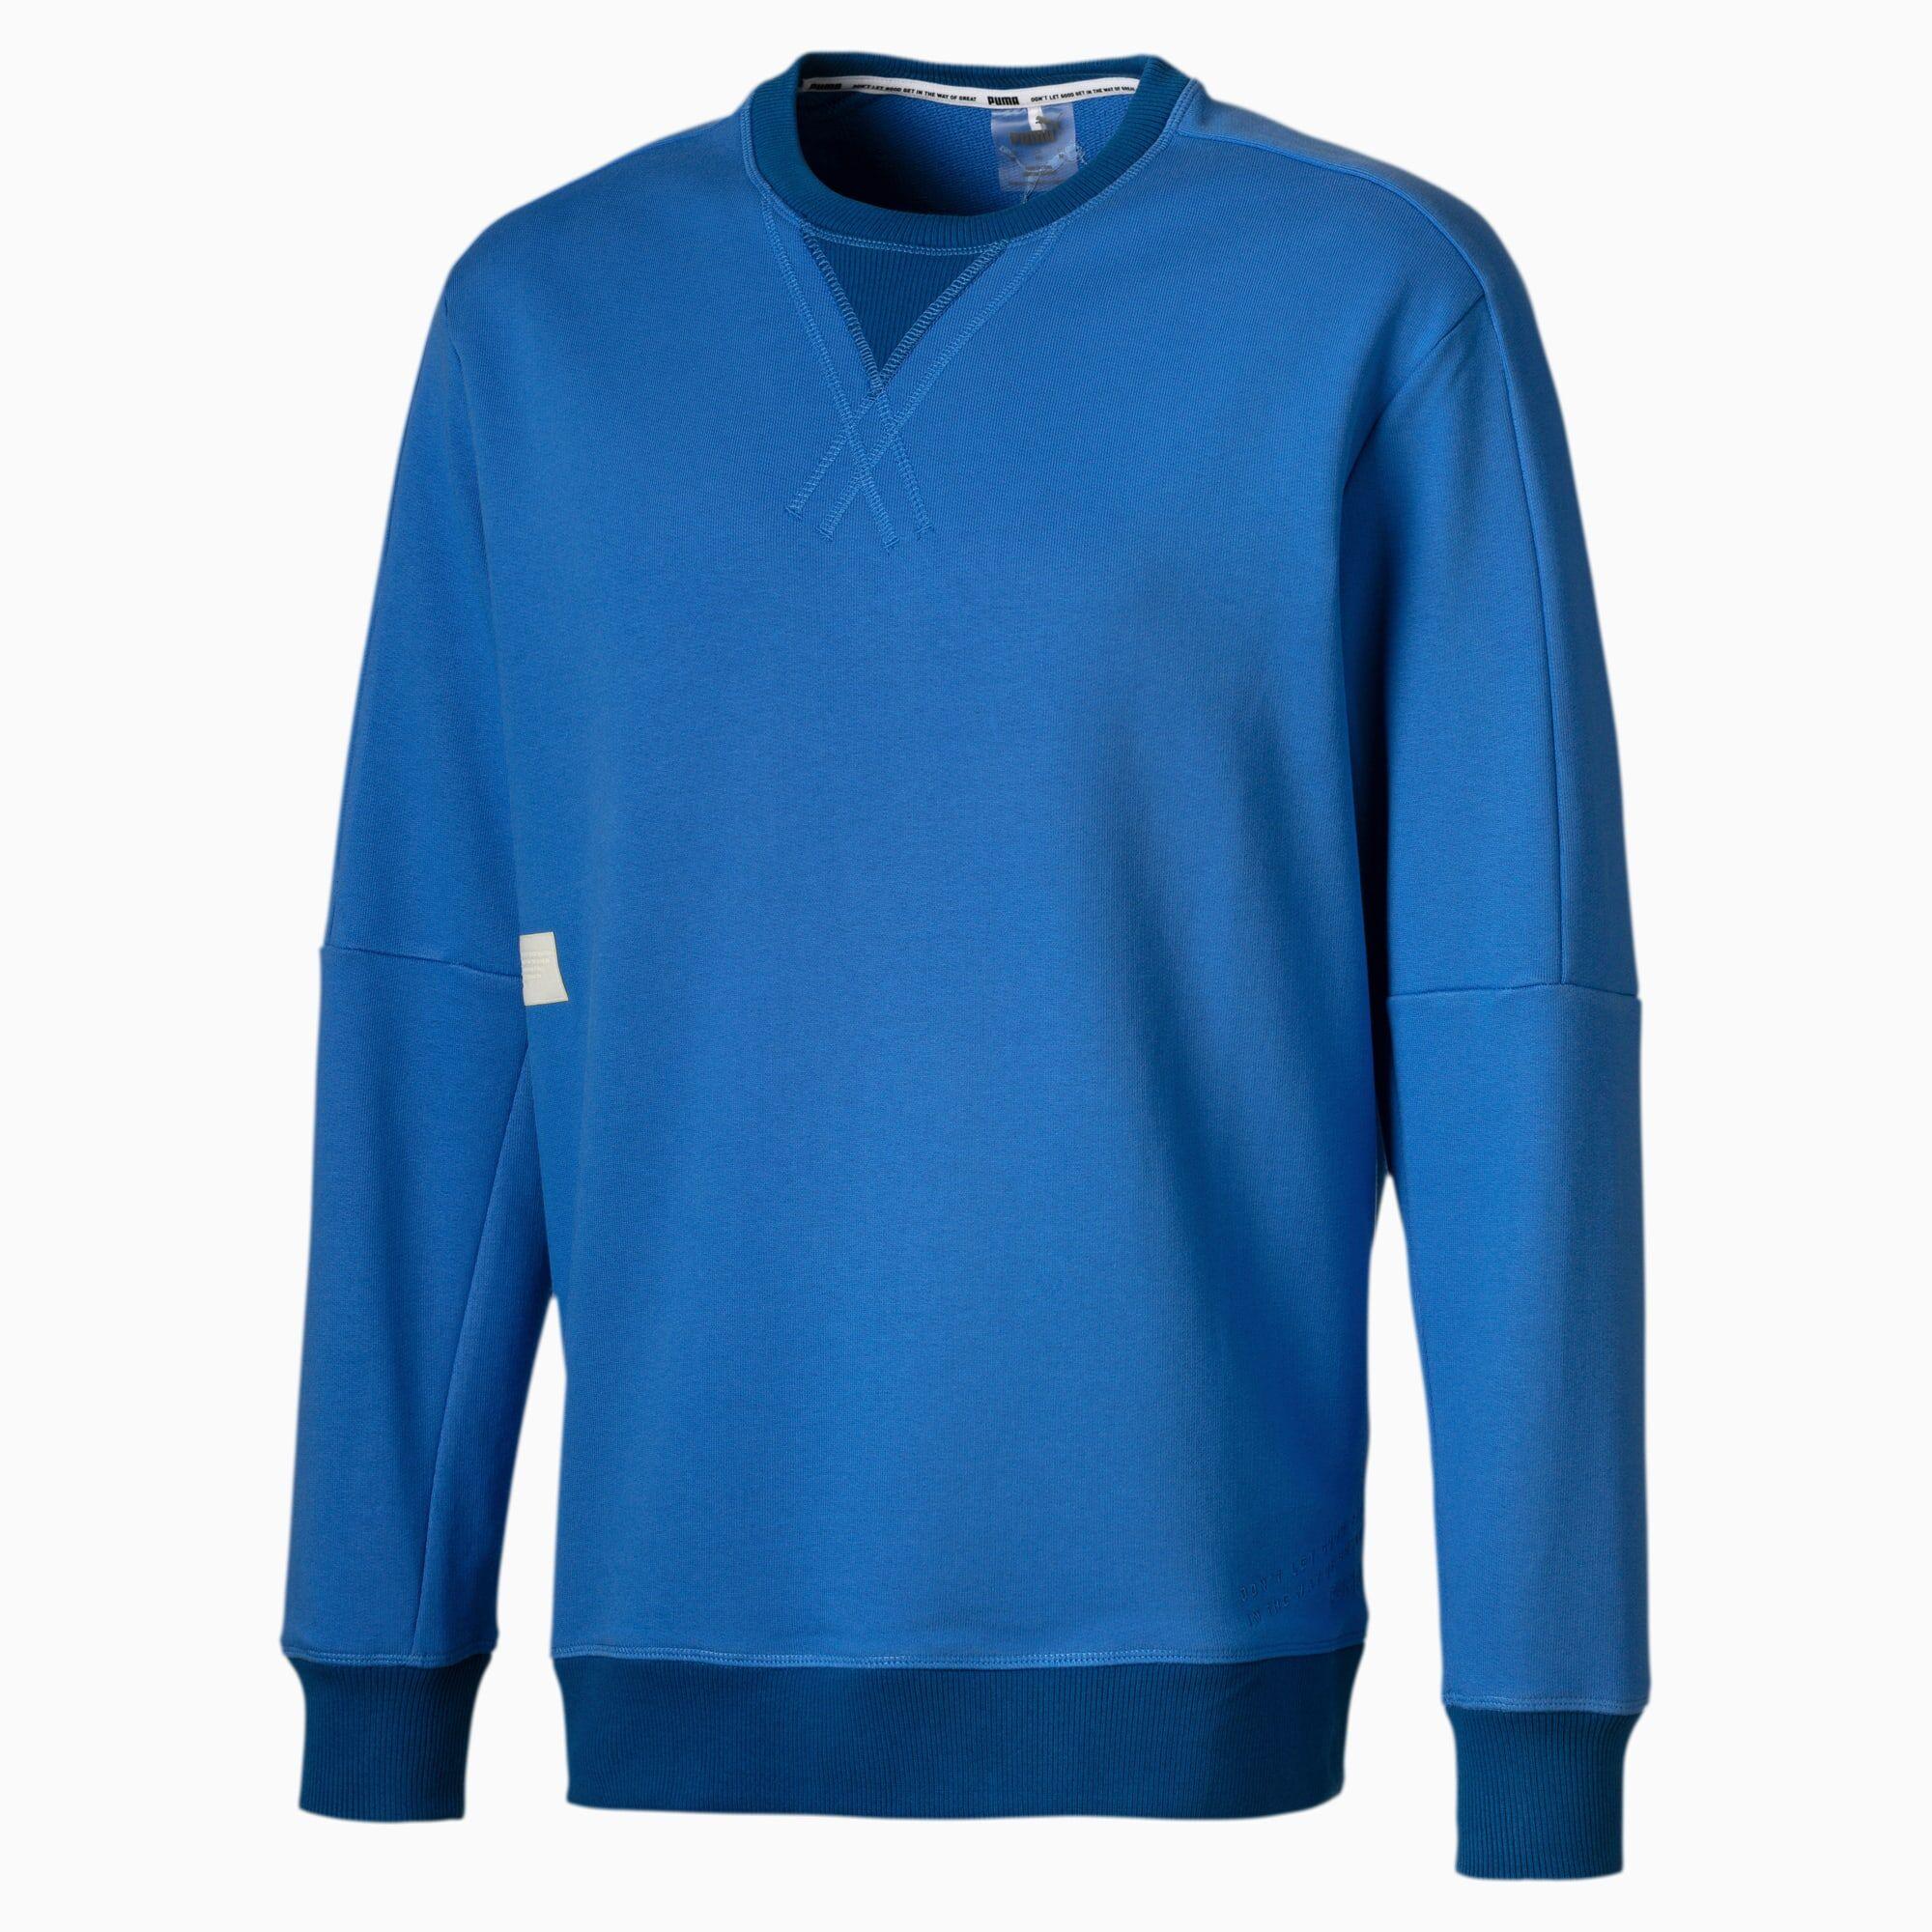 PUMA Sweat Jump Hook Basketball pour Homme, Bleu, Taille XL, Vêtements